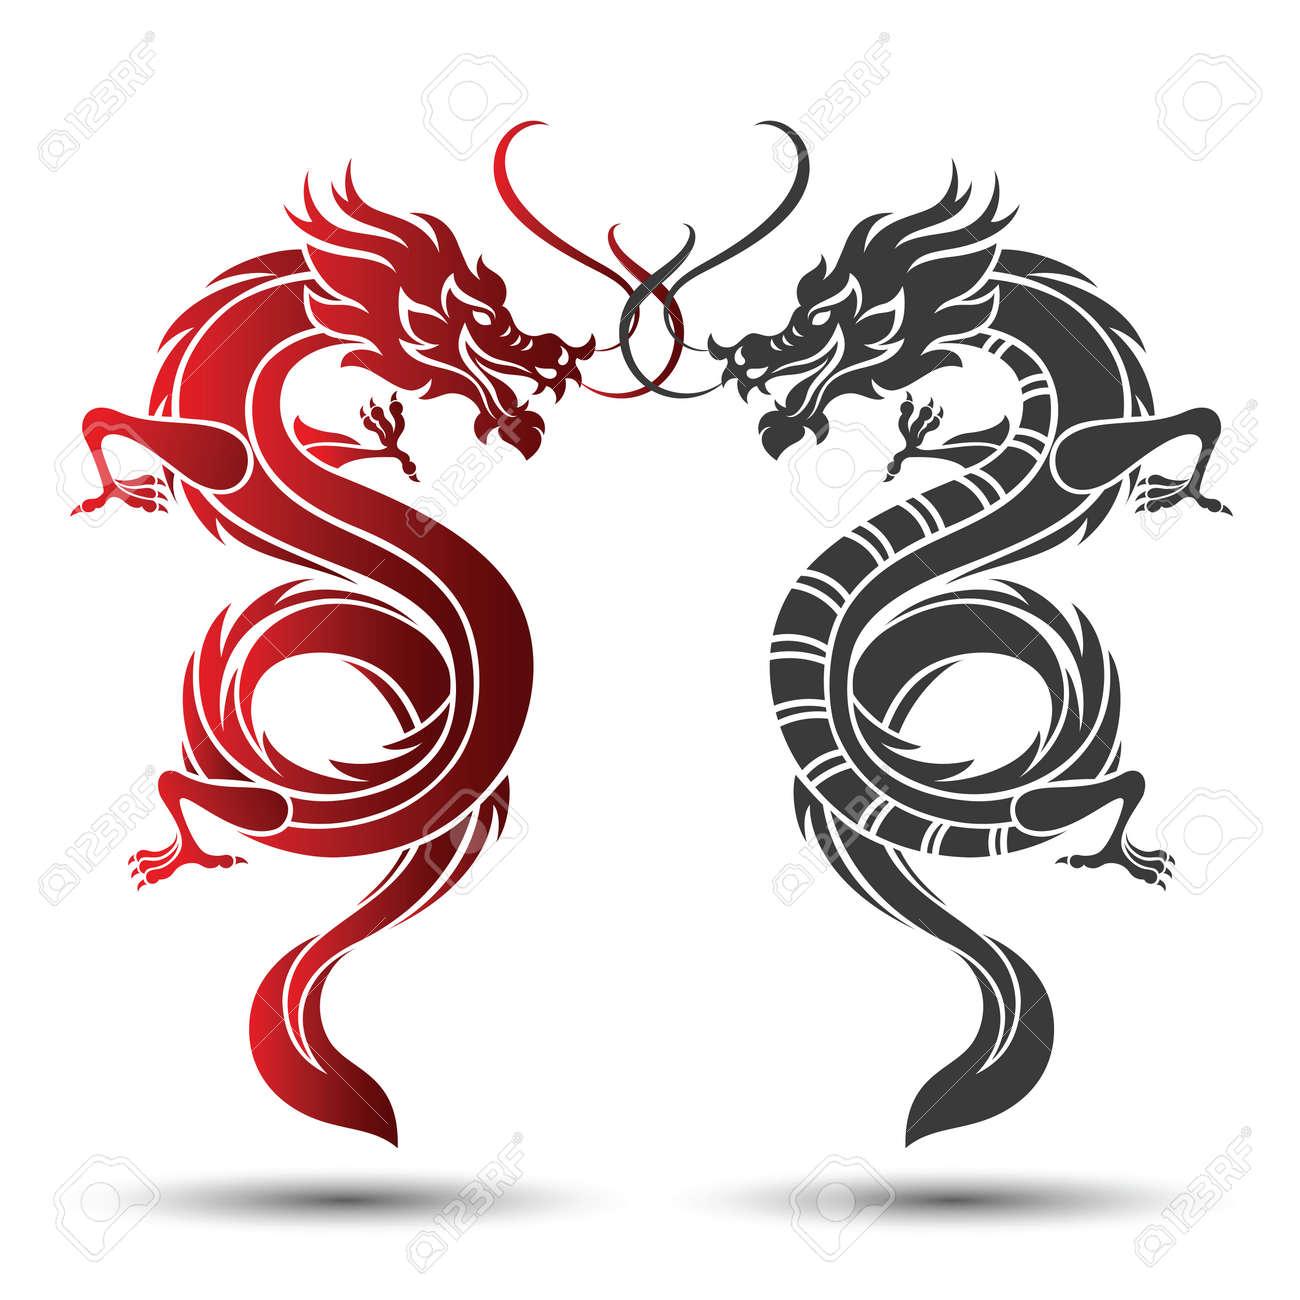 Illustration of Traditional chinese Dragon ,vector illustration - 57487154